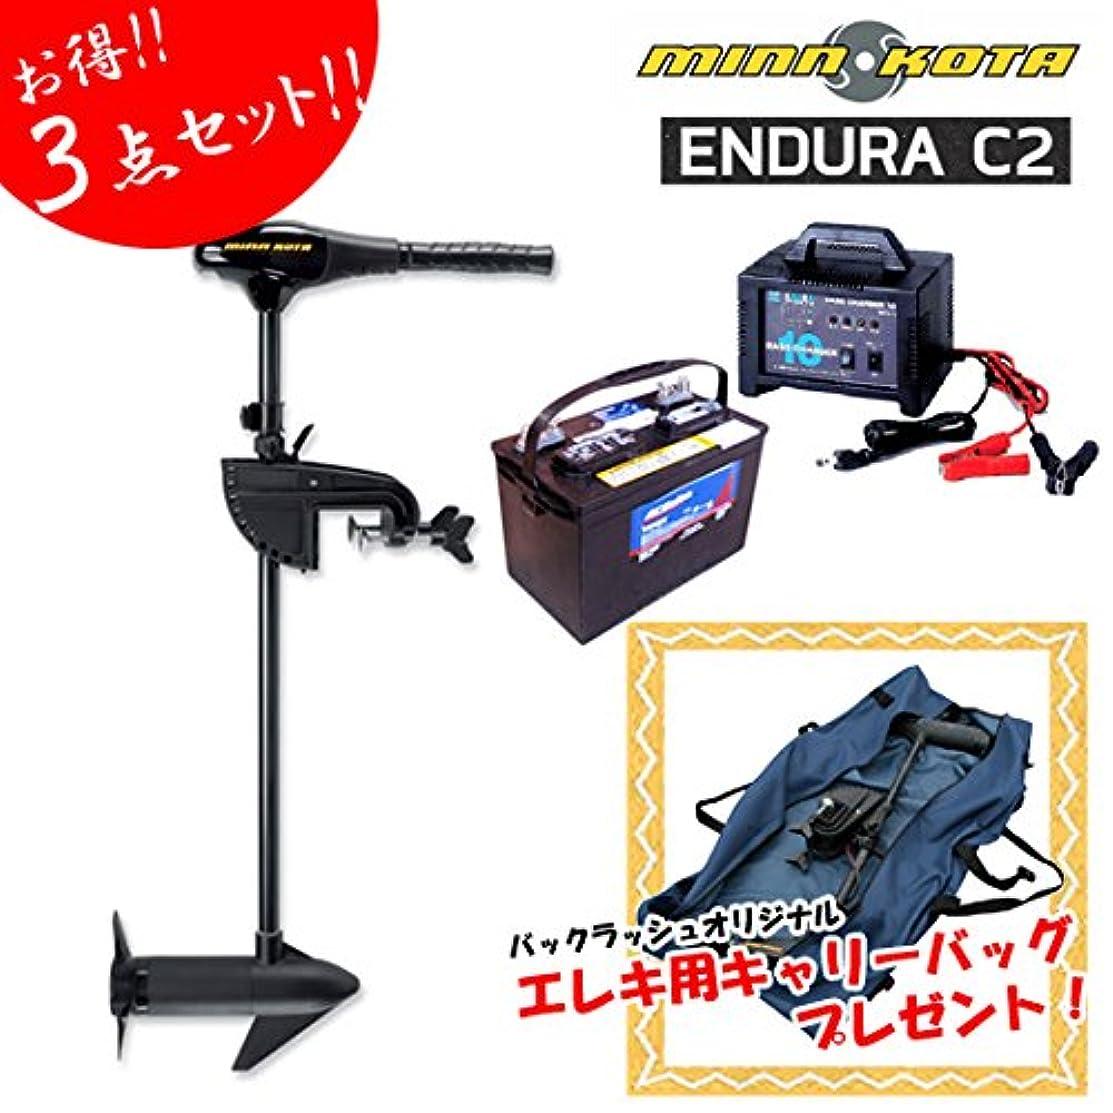 minn kota 【3点セット】[プレゼントのエレキキャリーバッグは3月末発送です]minn kota/ミンコタ ENDURA55/エンデューラ 55 C2